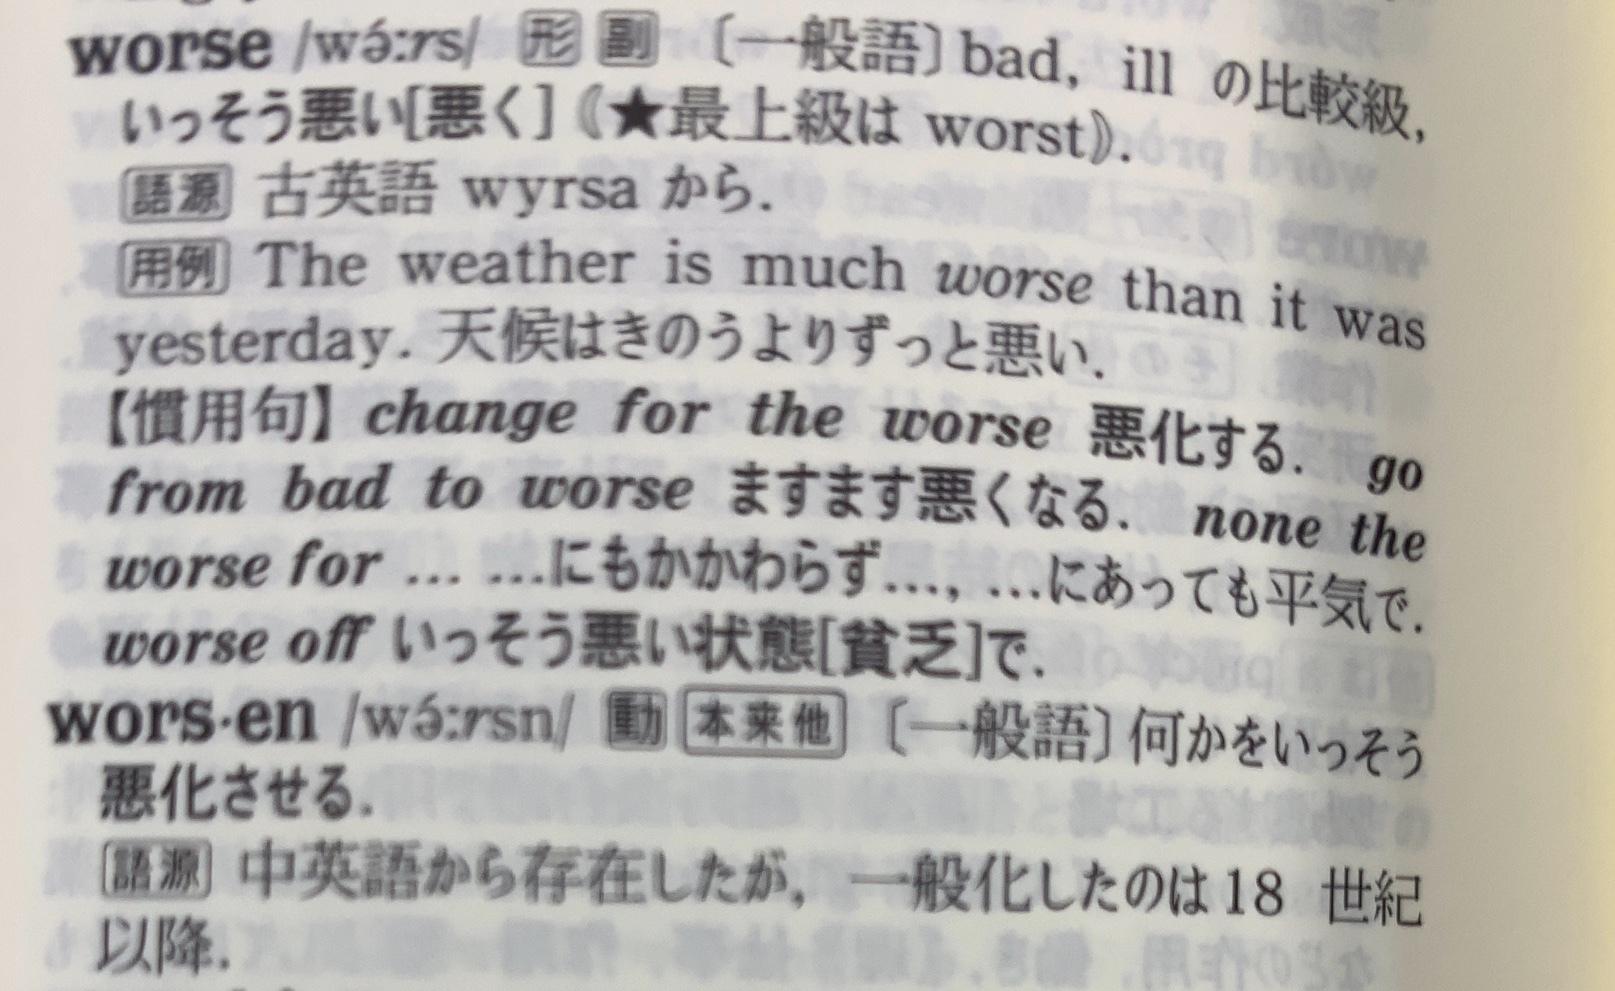 #019 worse, worst, better, bestについて_a0383591_11075803.jpeg